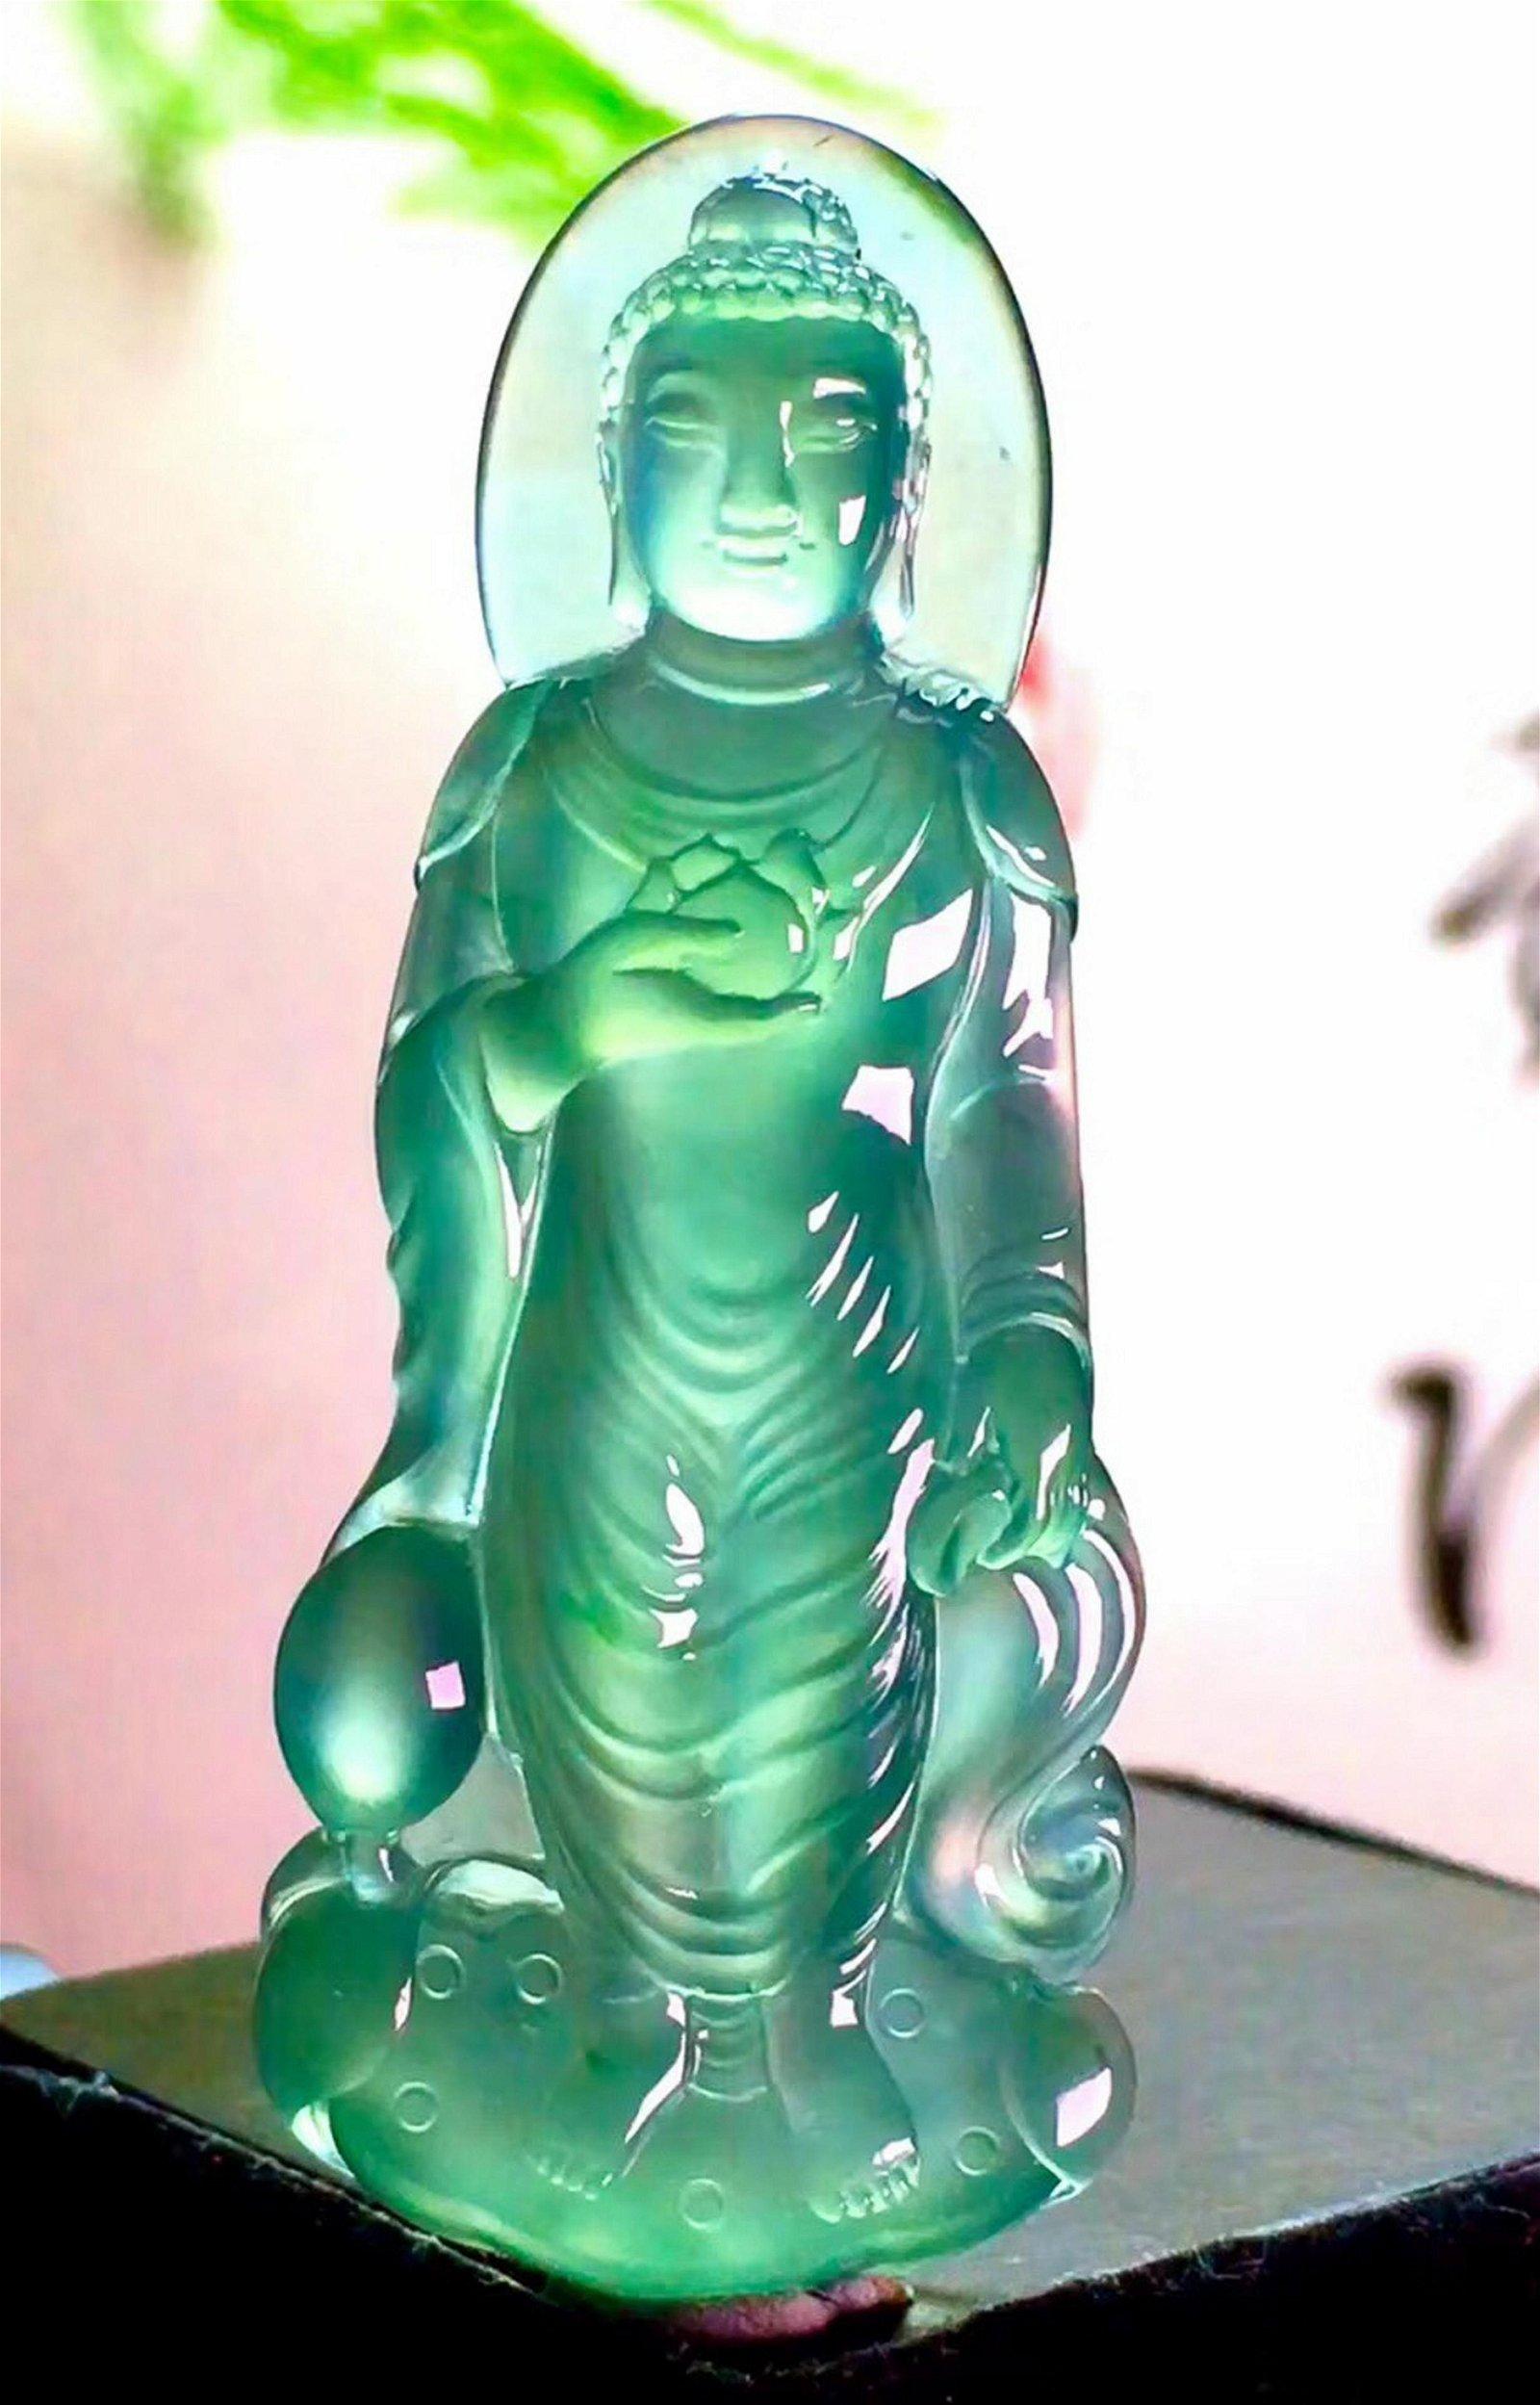 AN ICY JADEITE SHAKYAMUNI BUDDHA SHAPED PENDANT